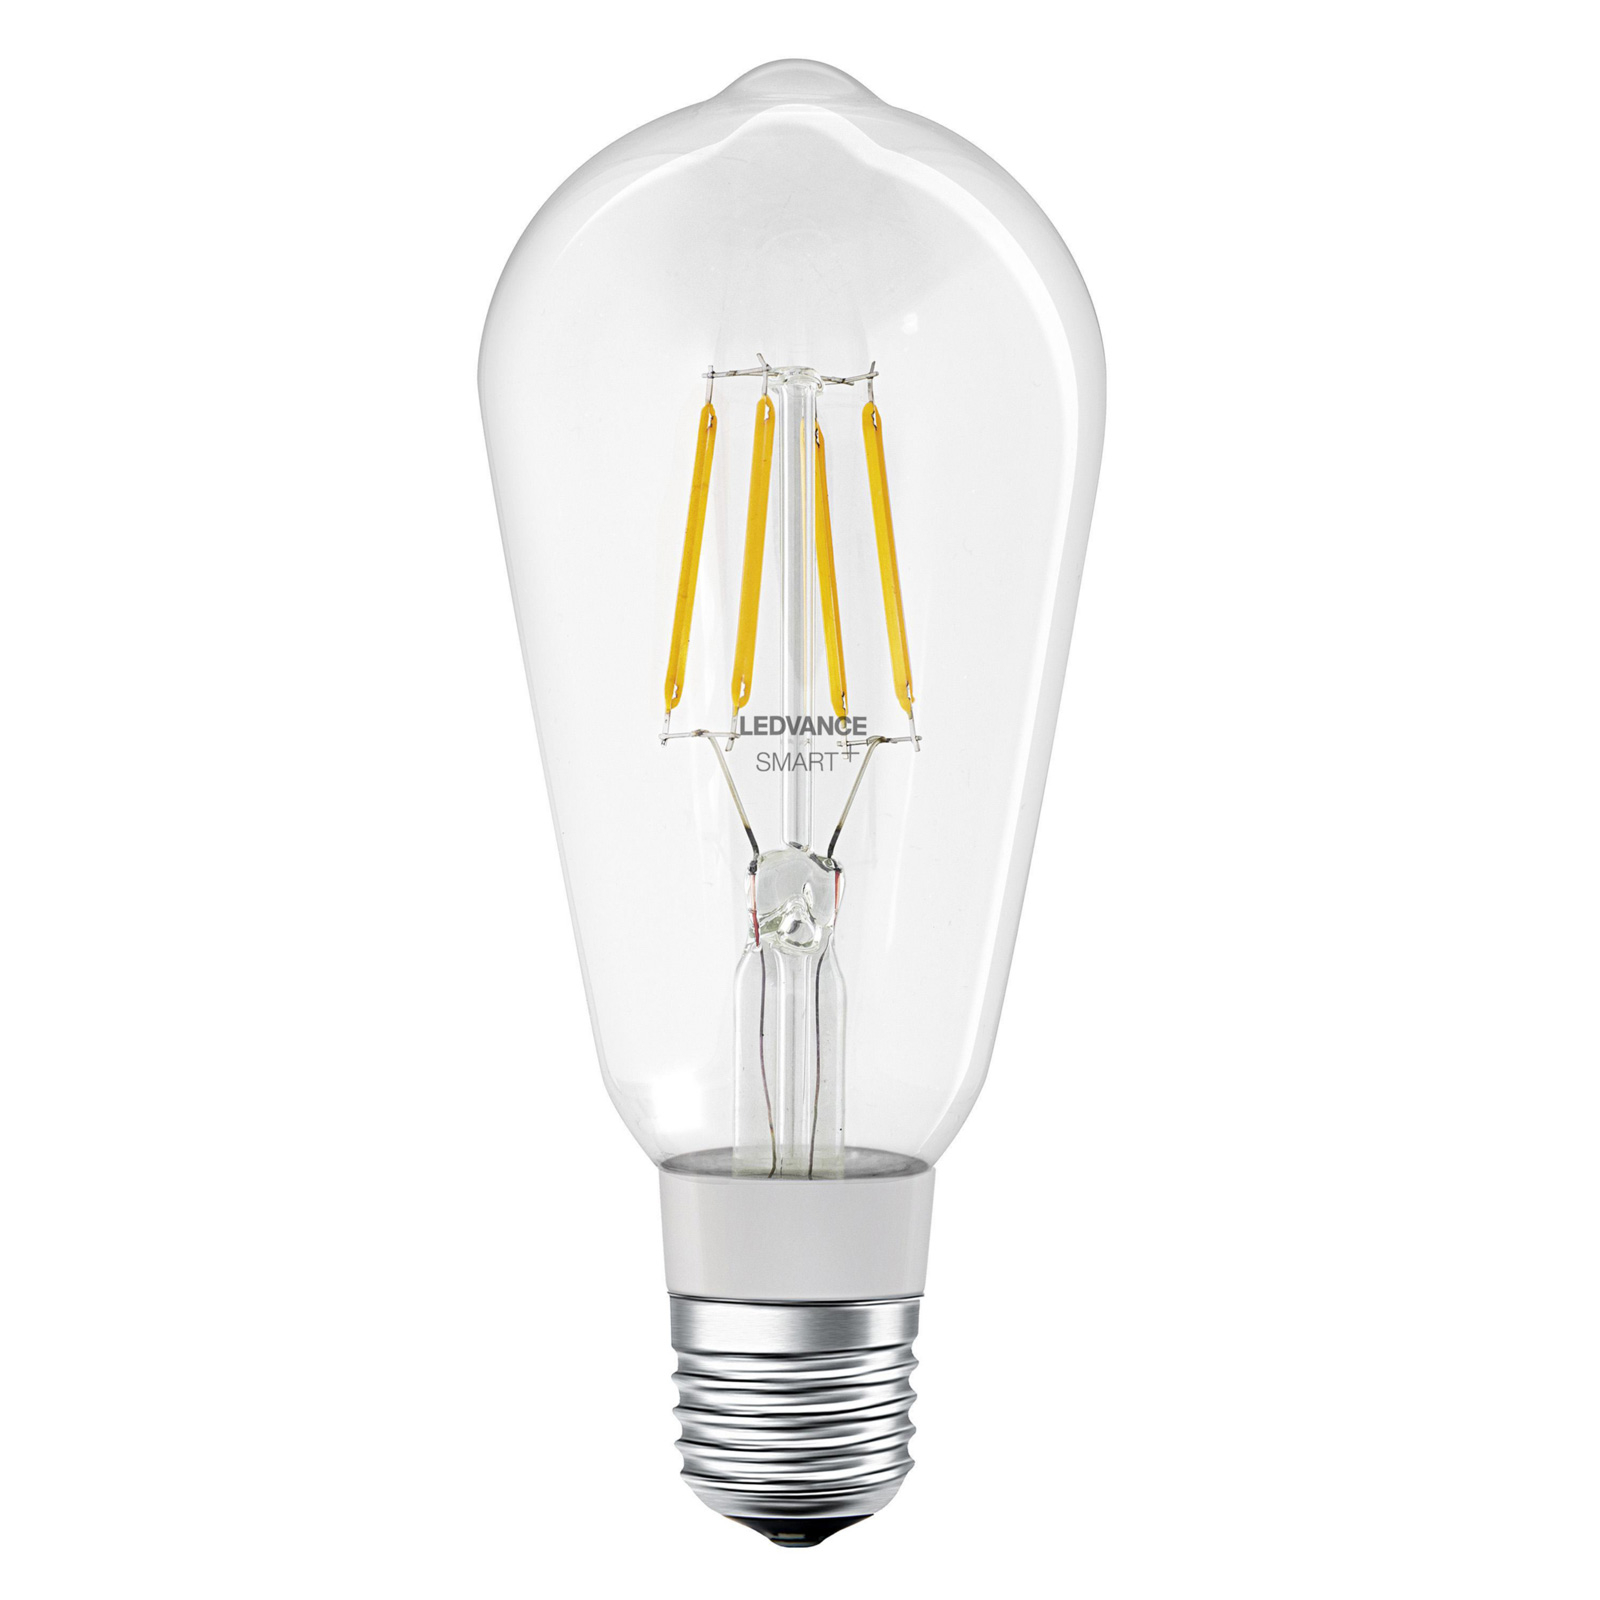 LEDVANCE SMART+ Bluetooth E27 Edison 5,5W 2.700K